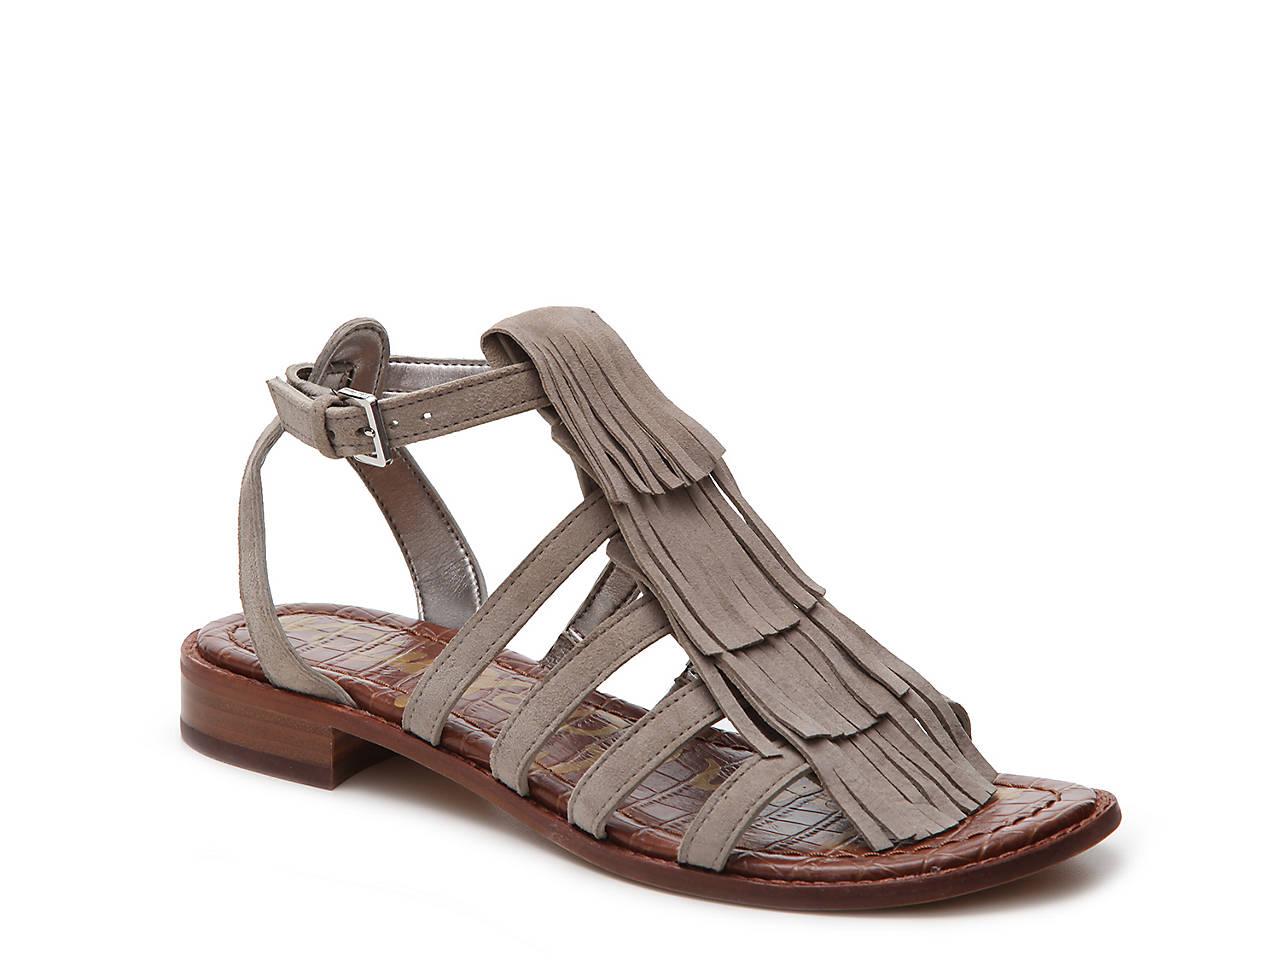 4970afd135d891 Sam Edelman Estelle Gladiator Sandal Women s Shoes